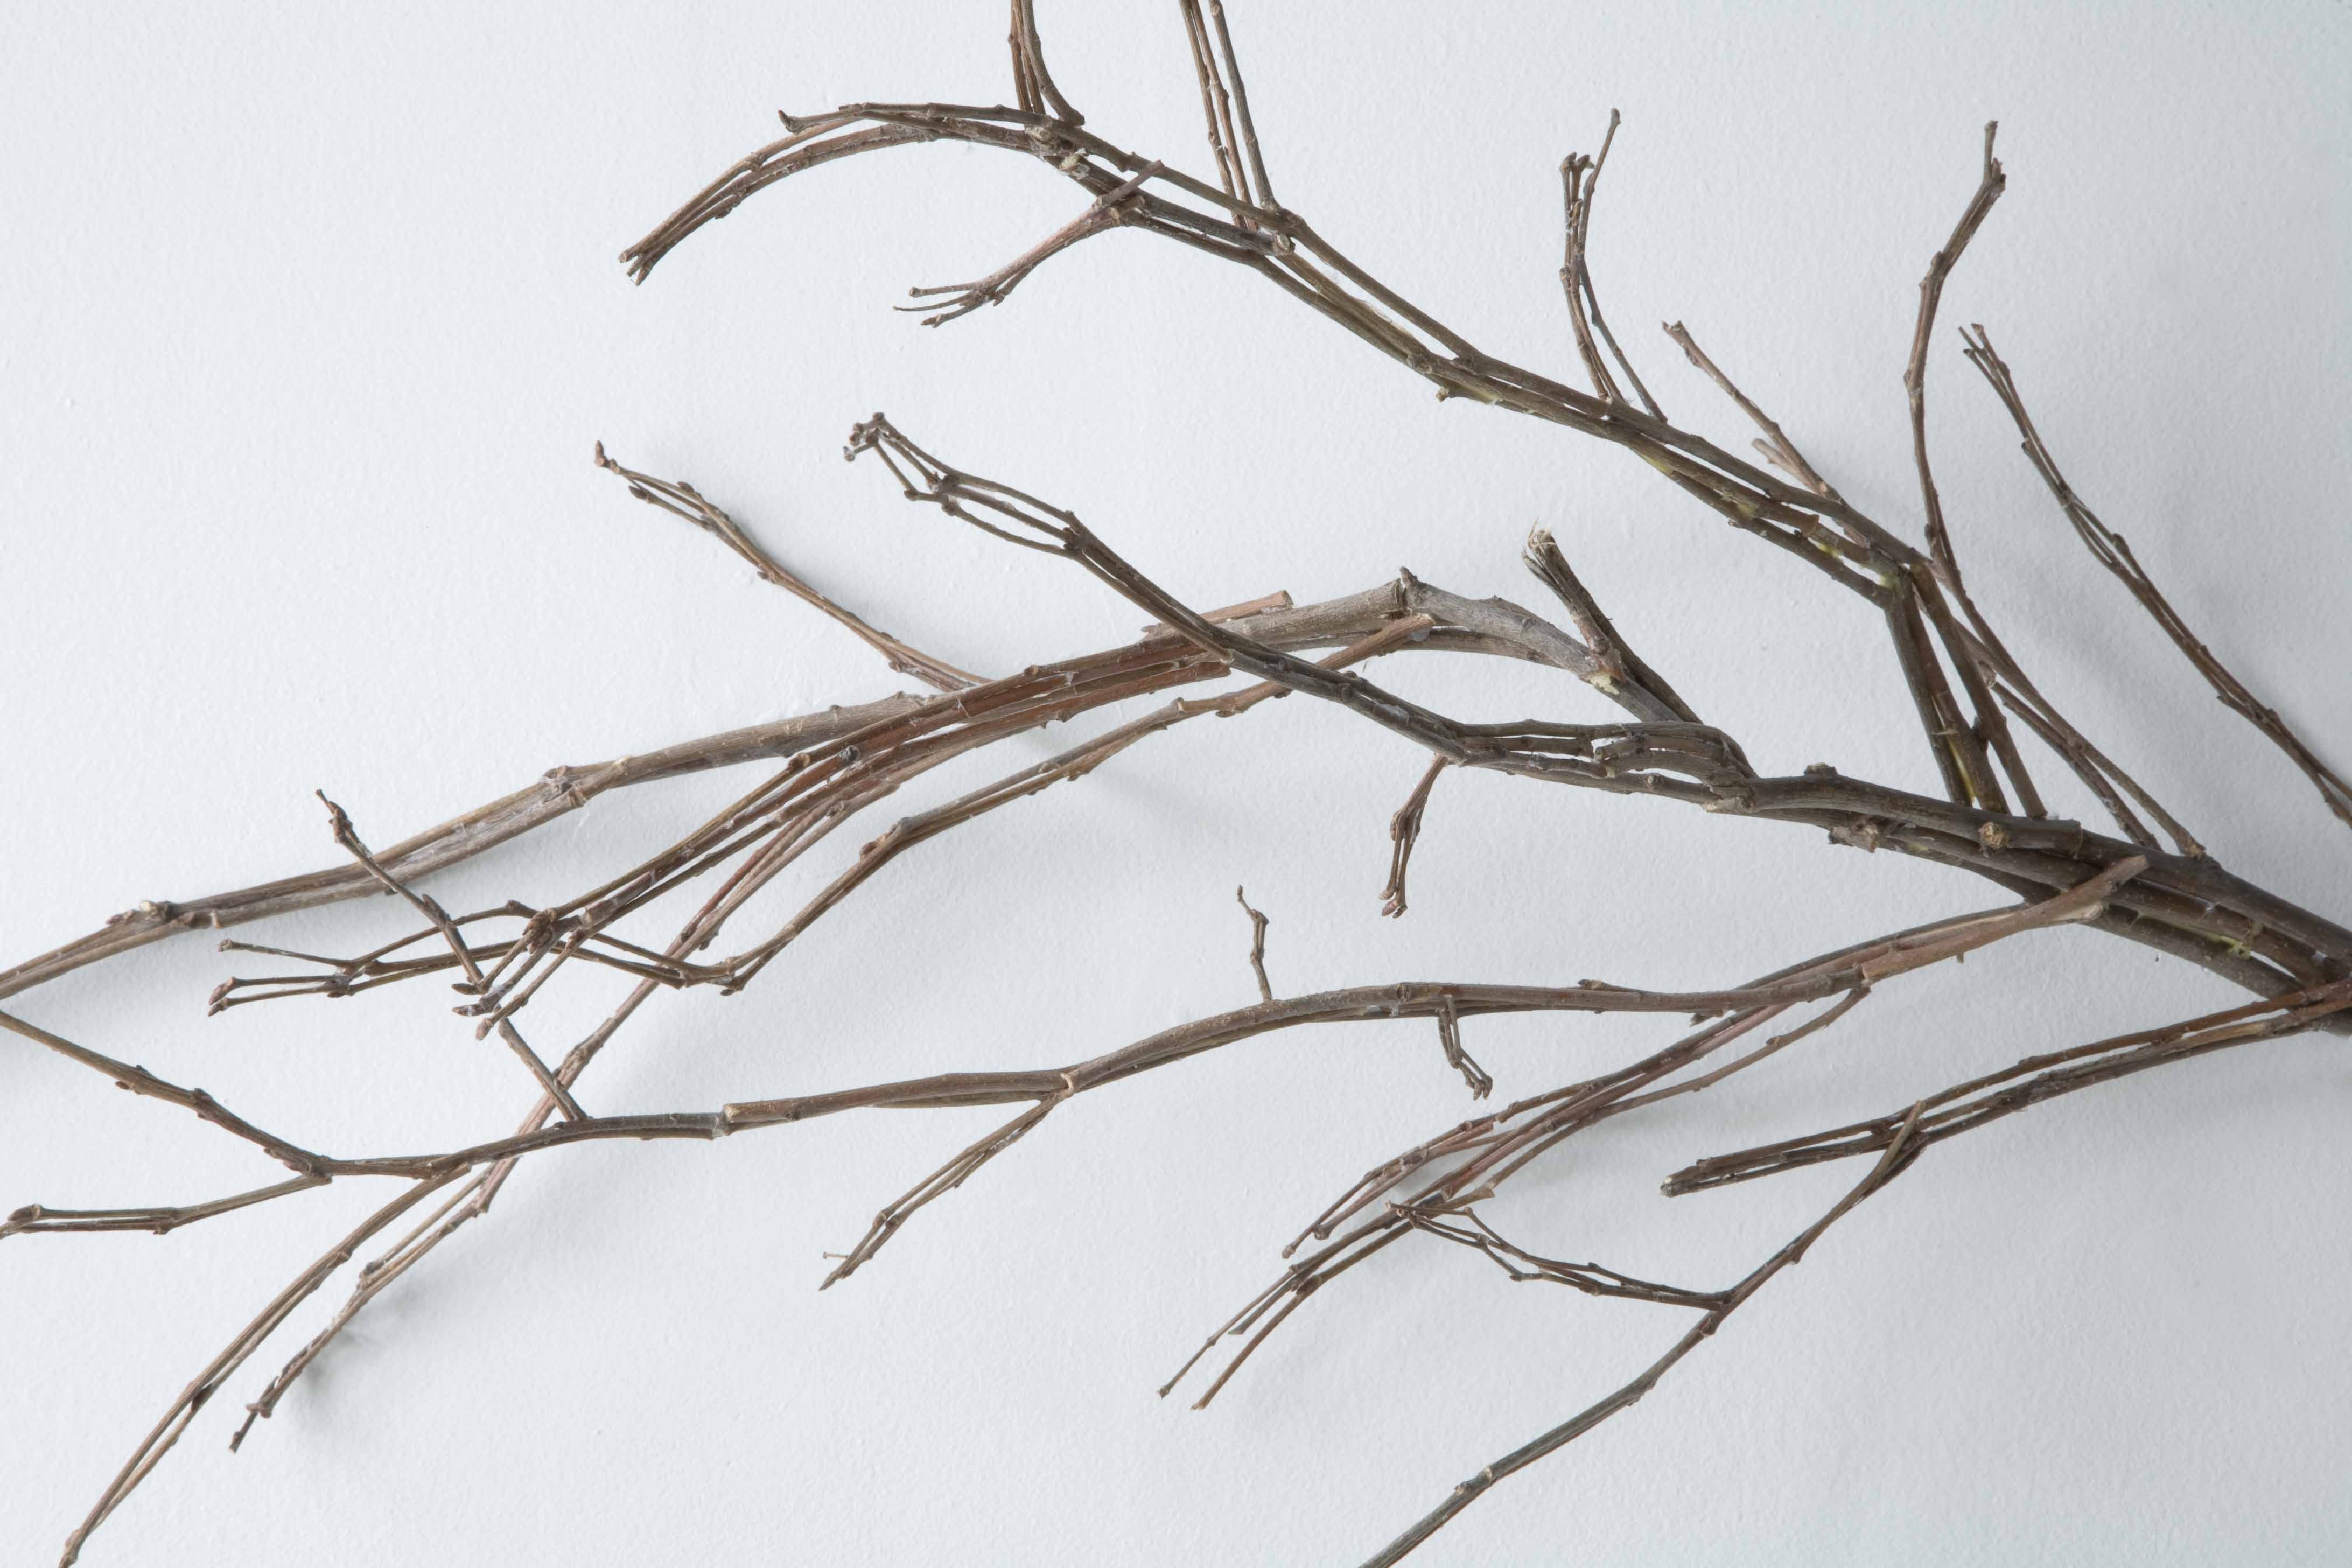 Jonathan Plante, Treesome (détail), 2008, bois, wood